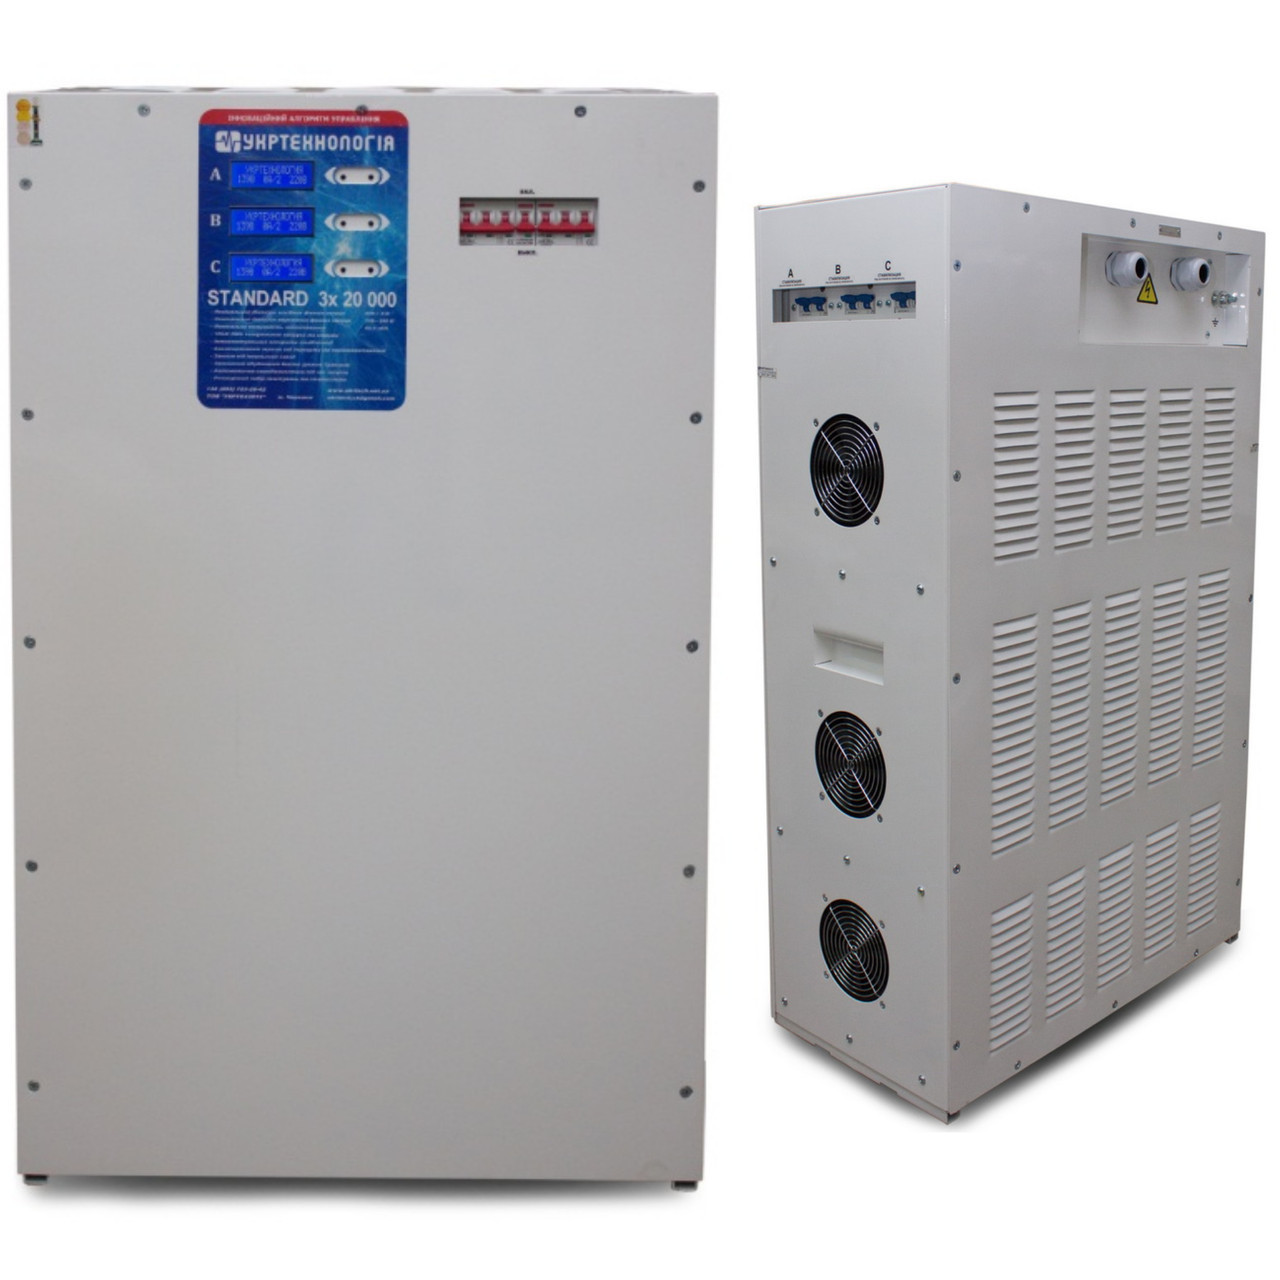 Стабилизатор напряжения Укртехнология HCH 3x9000 Standard 27 кВт